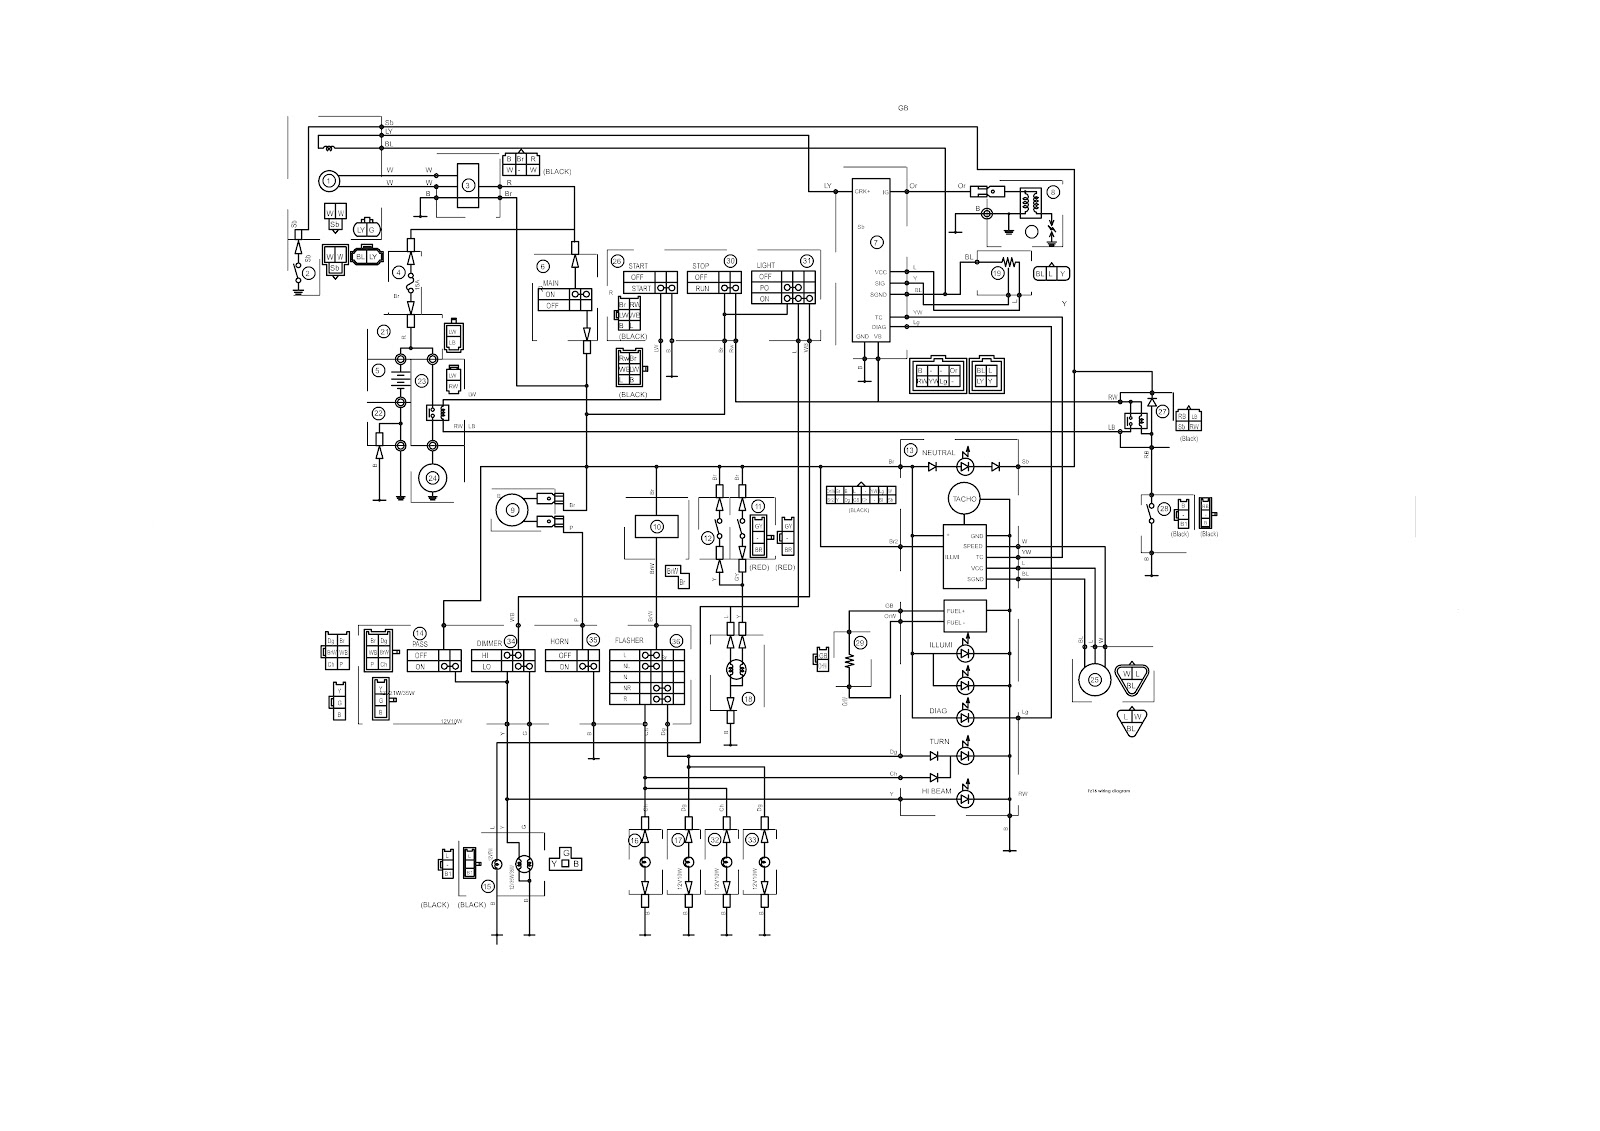 Yamaha Fzr Wiring Diagram R6 Harness Pengkabelan Byson Menjual Spare Rh Sukucadangyamaha Blogspot Com Fz 09 1000